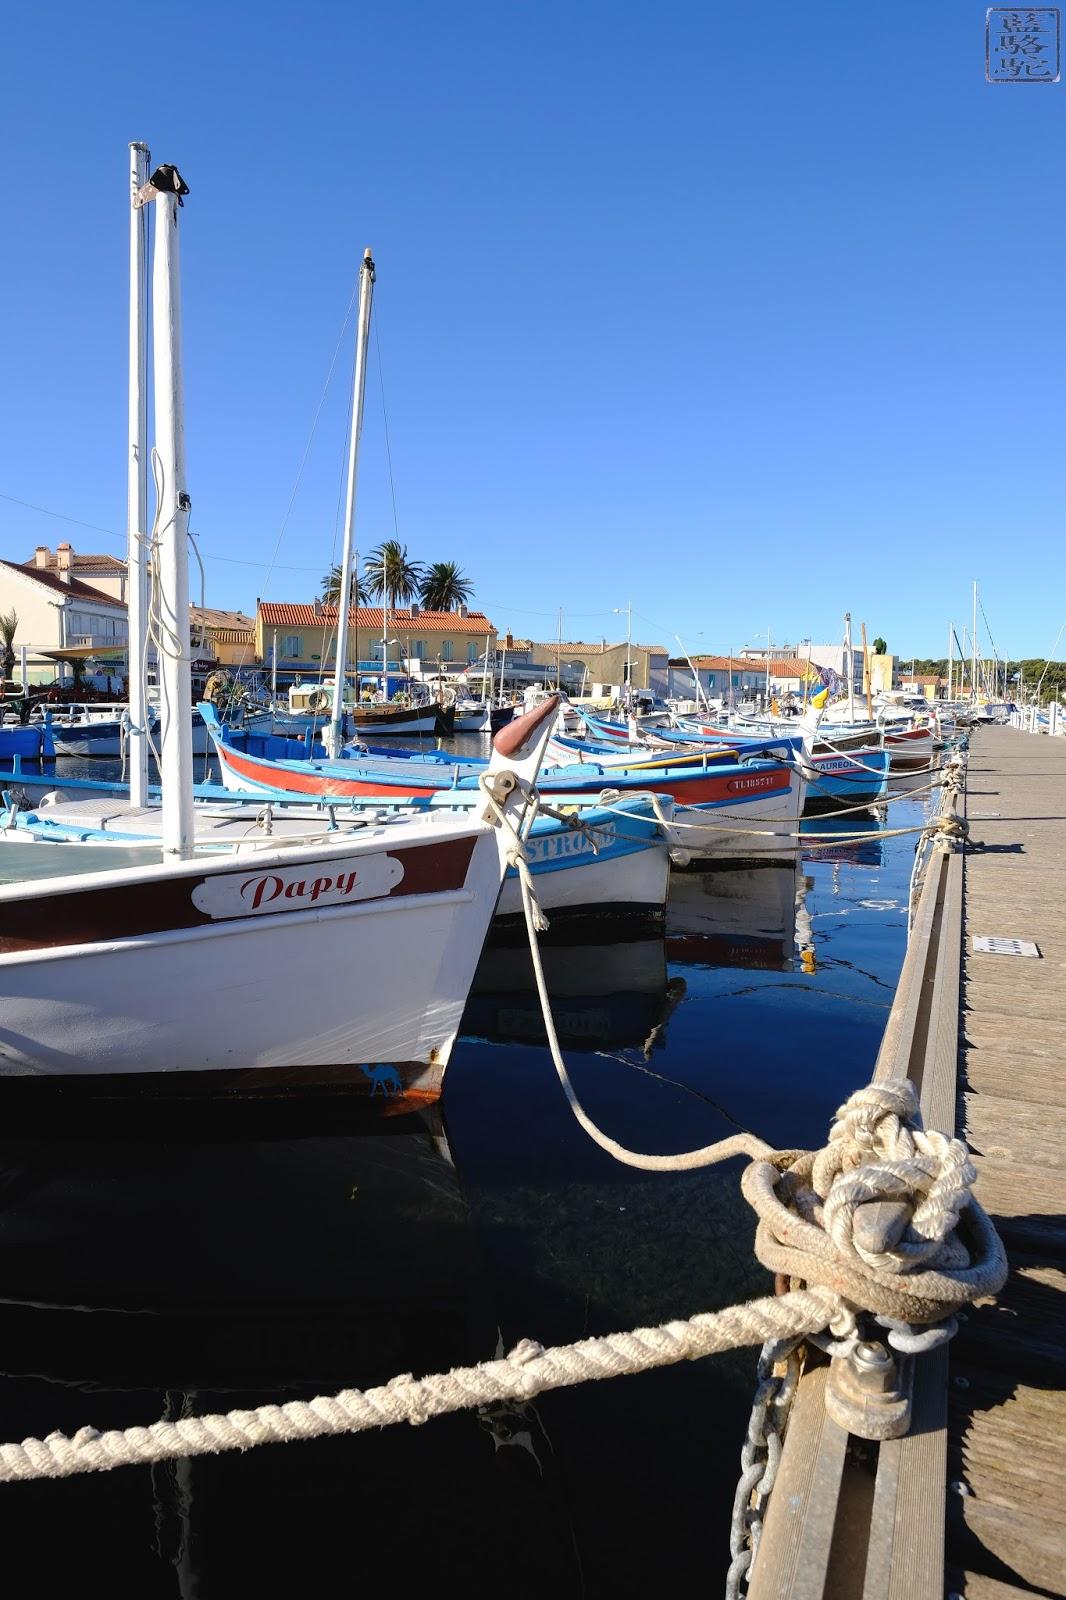 Le Chameau Bleu - Port du Brusc - Var